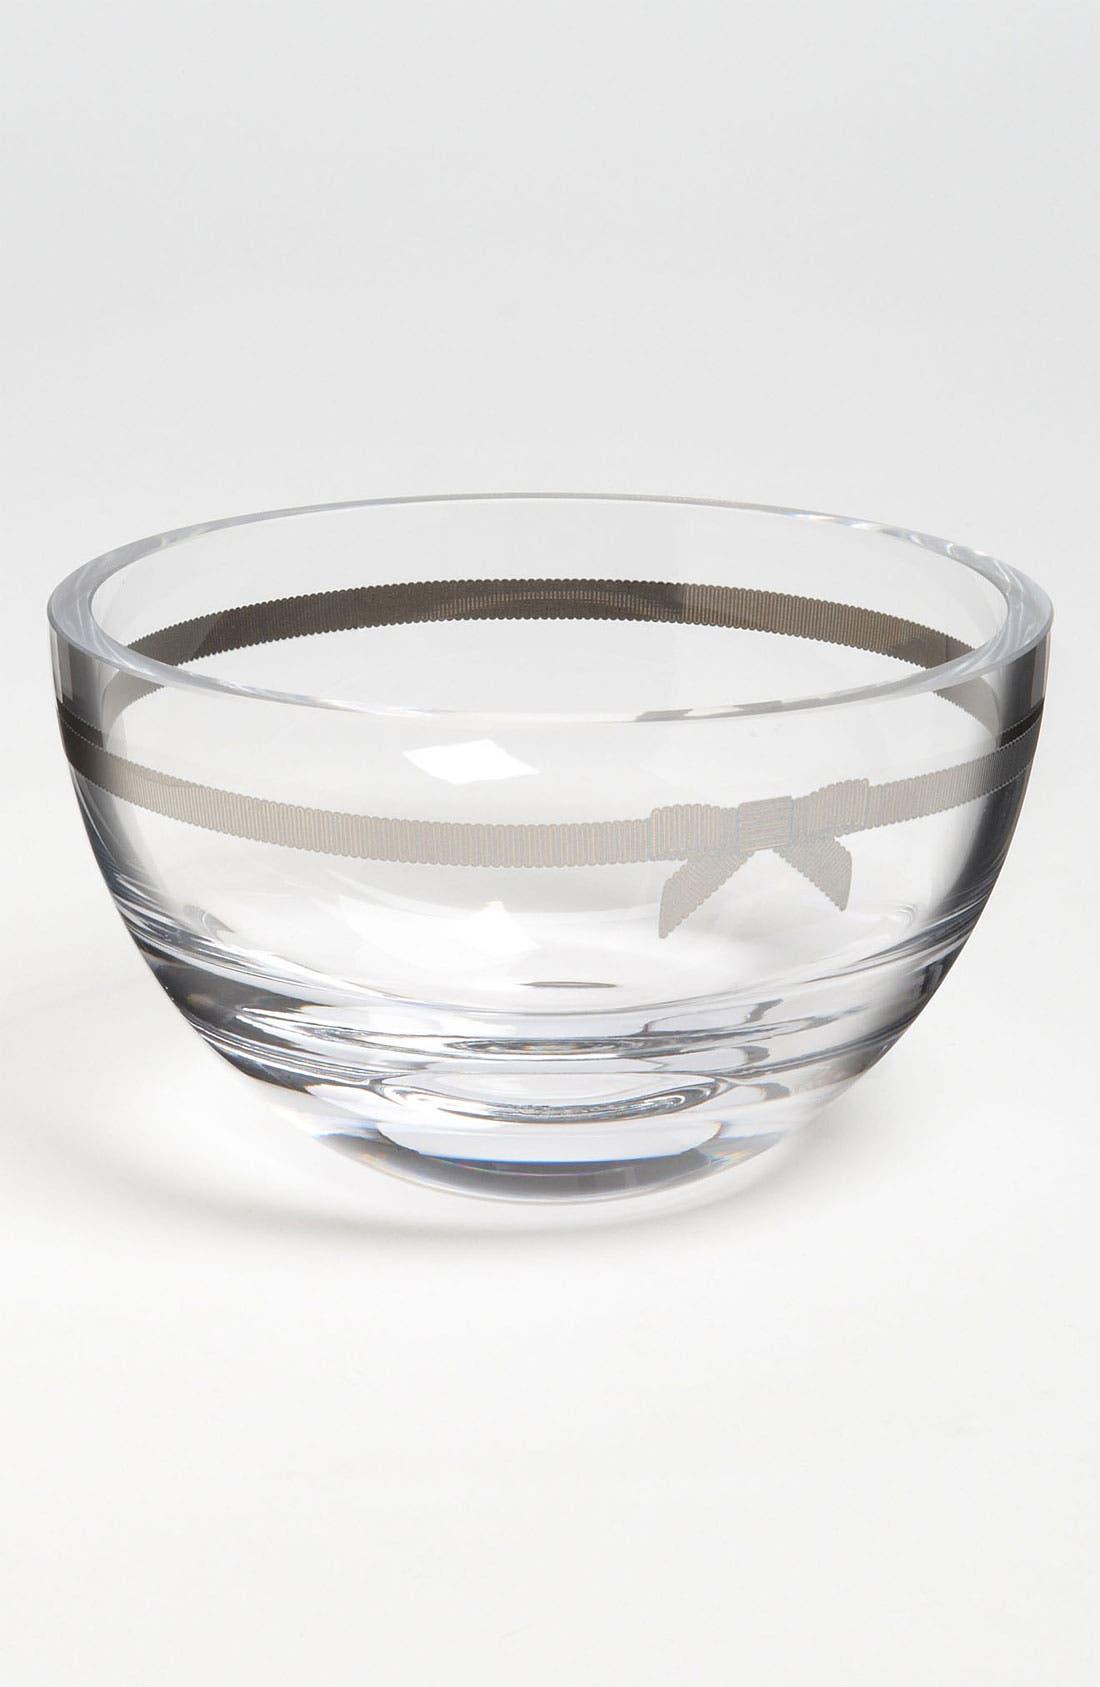 Alternate Image 1 Selected - kate spade new york 'grace avenue - small' bowl